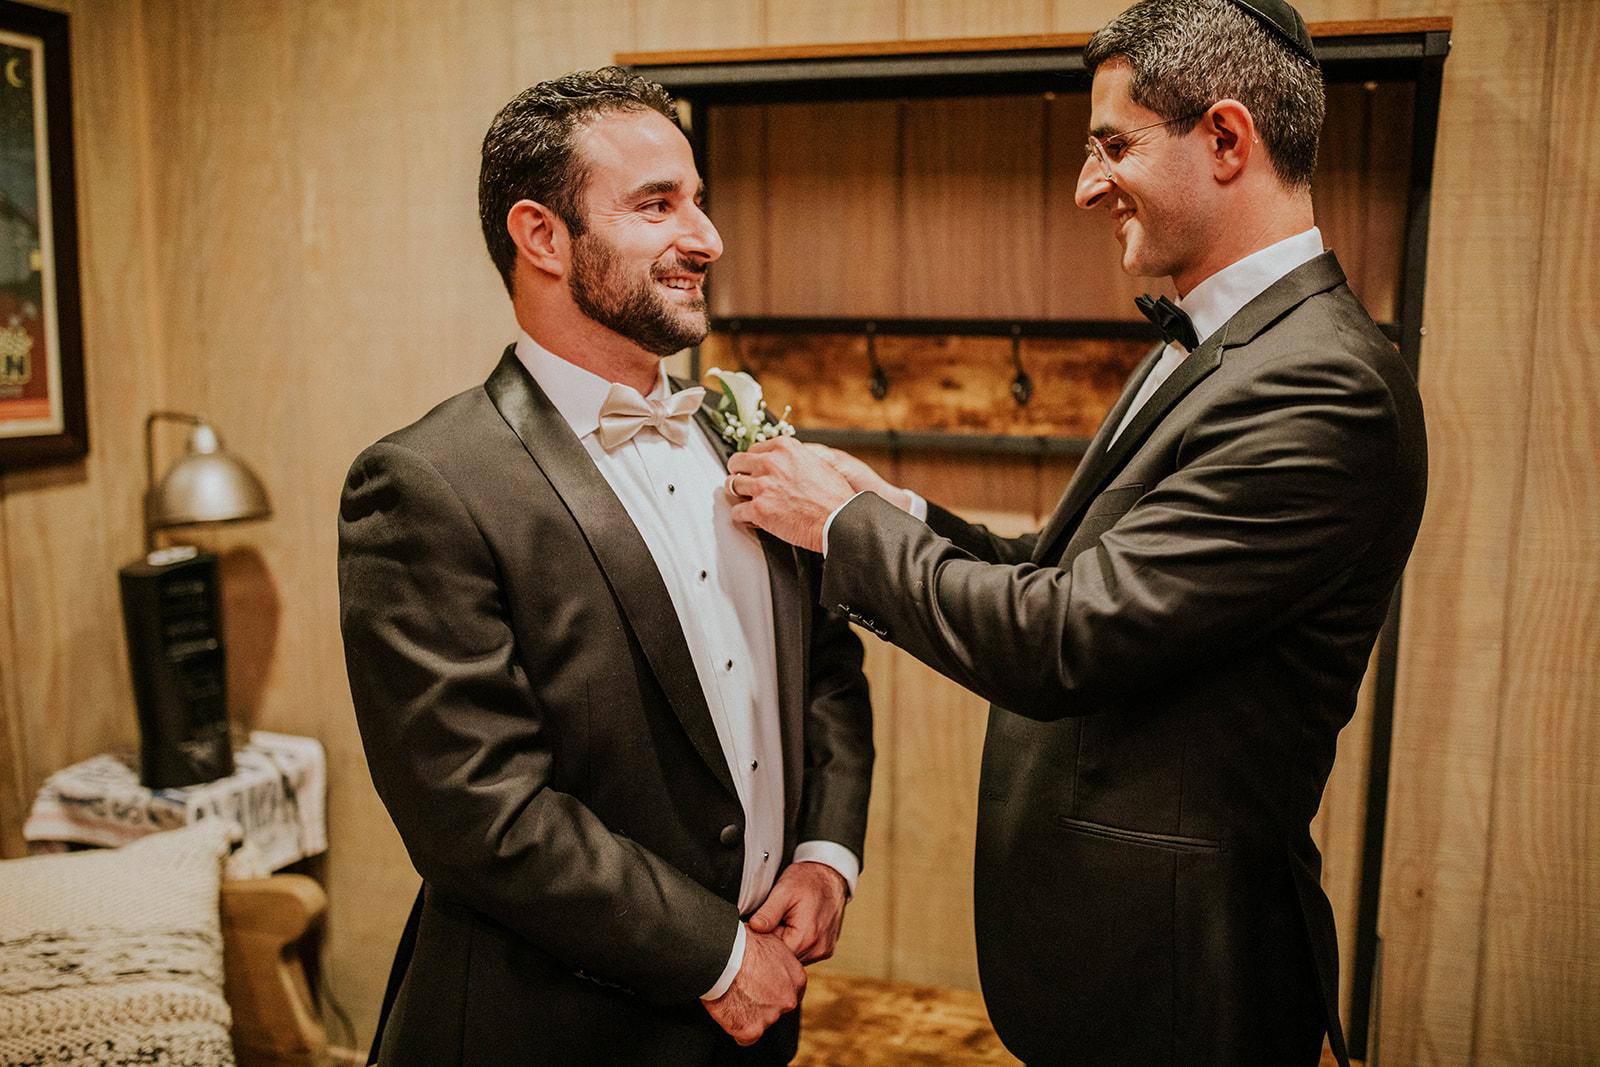 Groomsmen fixing grooms wedding boutonniere